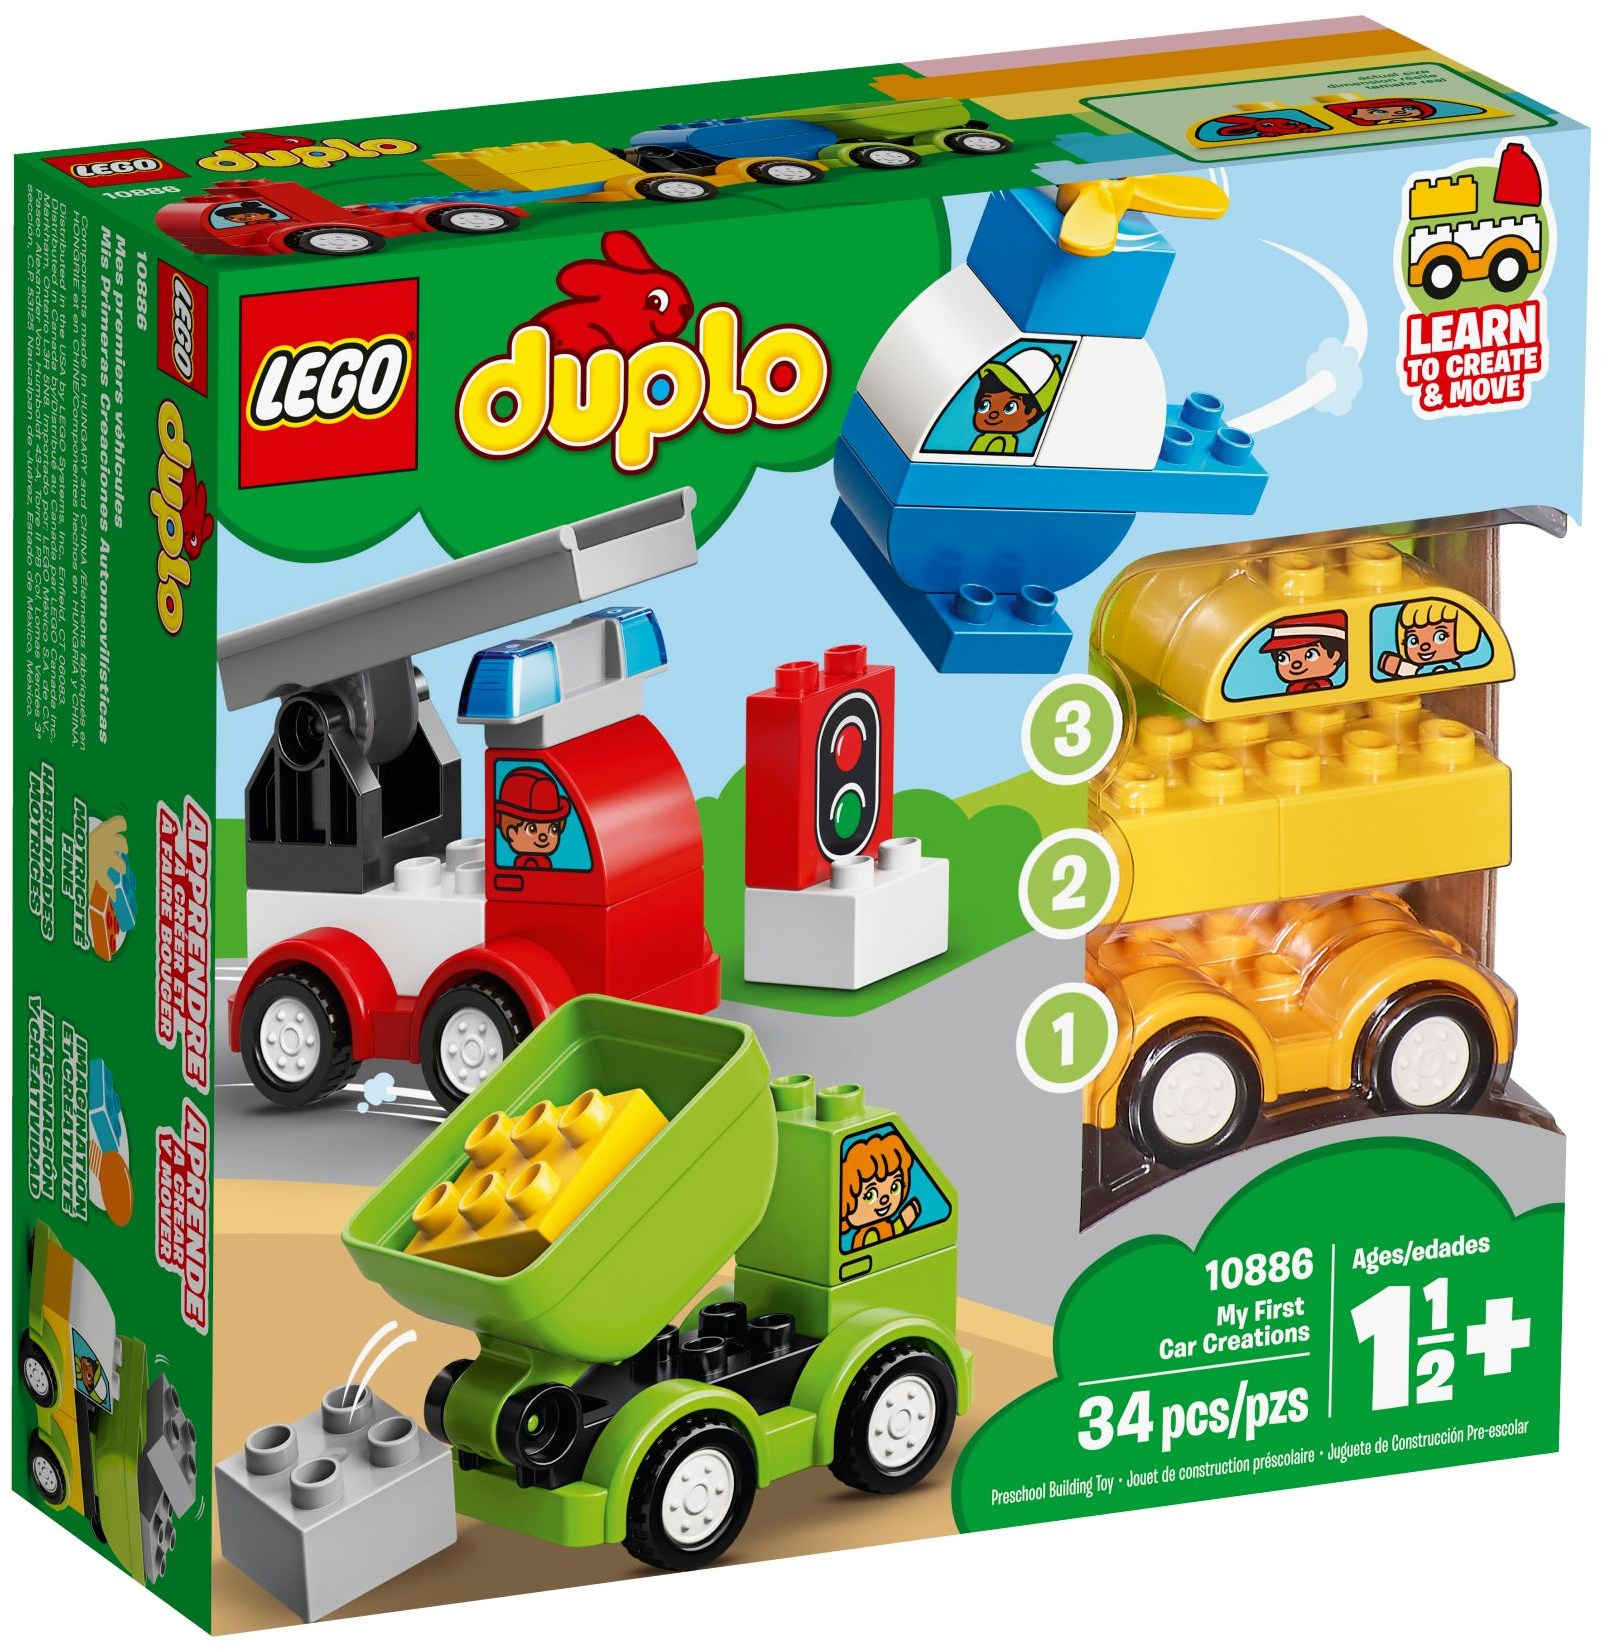 Truck Motor with Blower Bricks ~  Lego  ~ NEW ~ 2x2 Light Gray Car 2